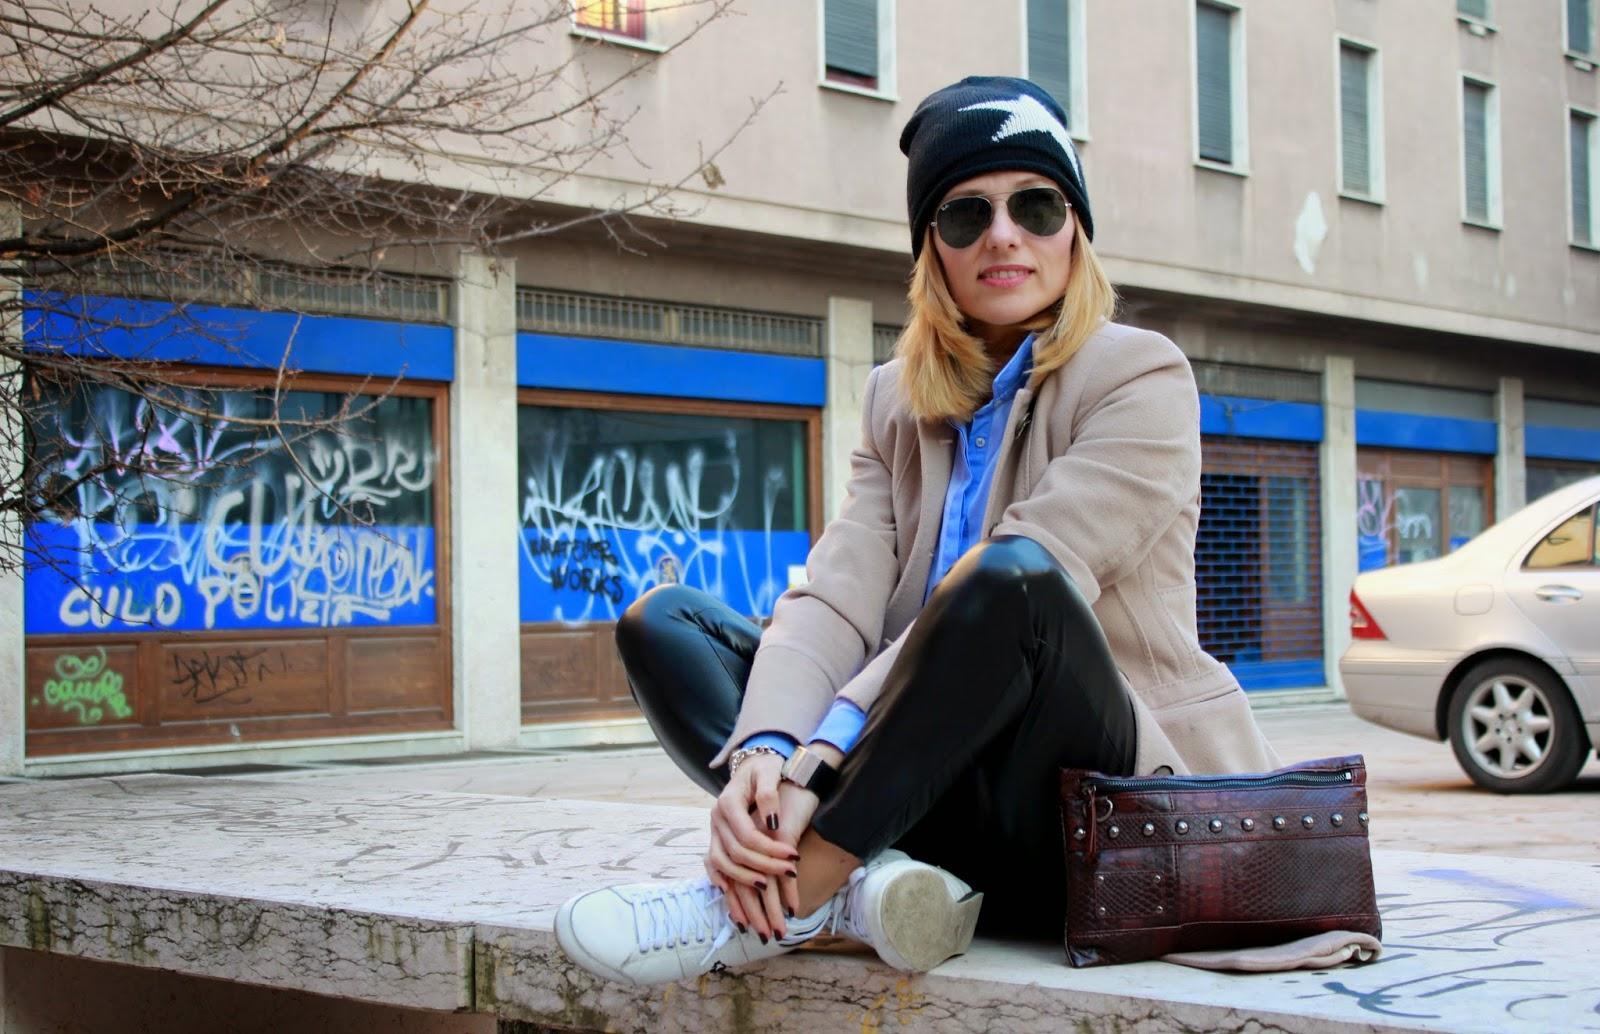 Eniwhere Fashion - Camel coat and Coq Sportif